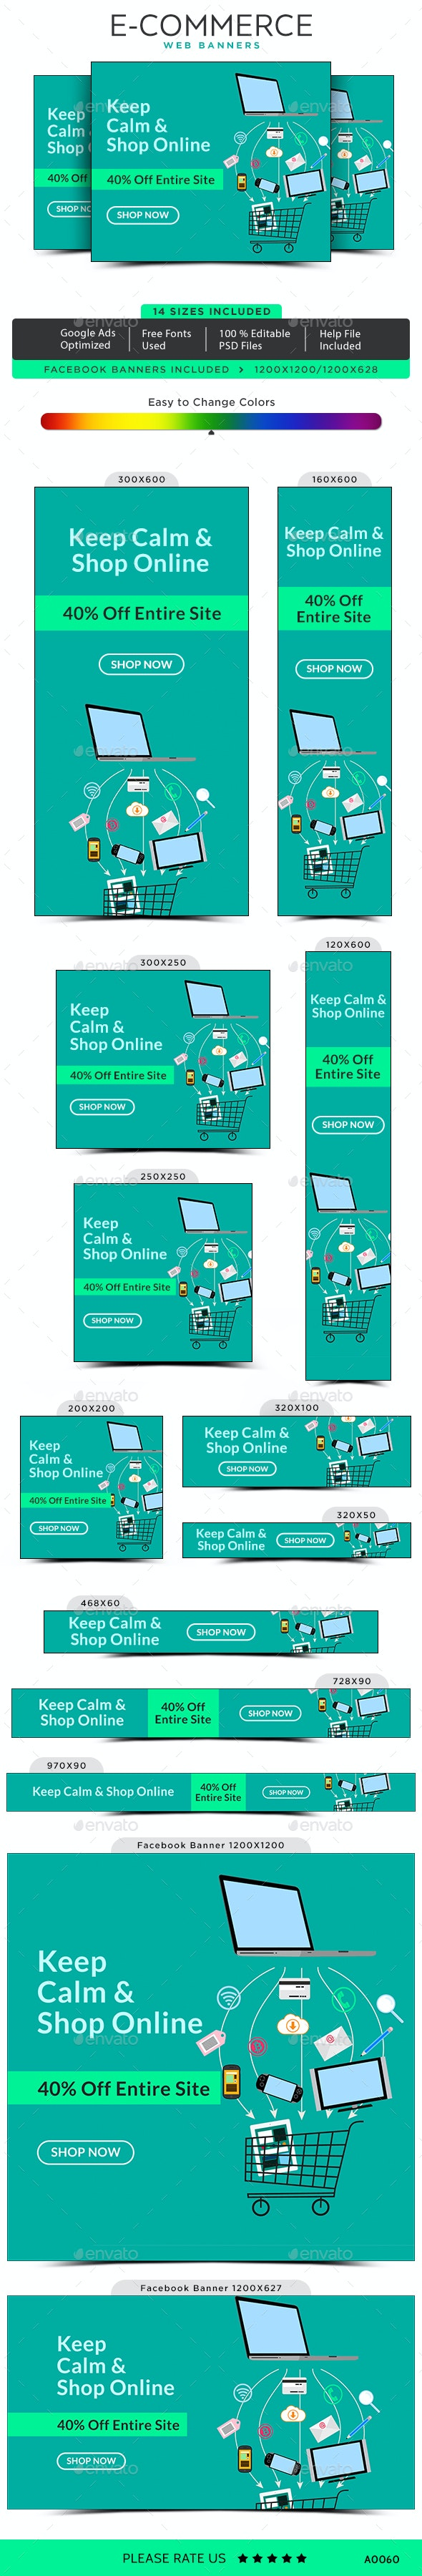 E-Commerce Web Banner Set - Banners & Ads Web Elements